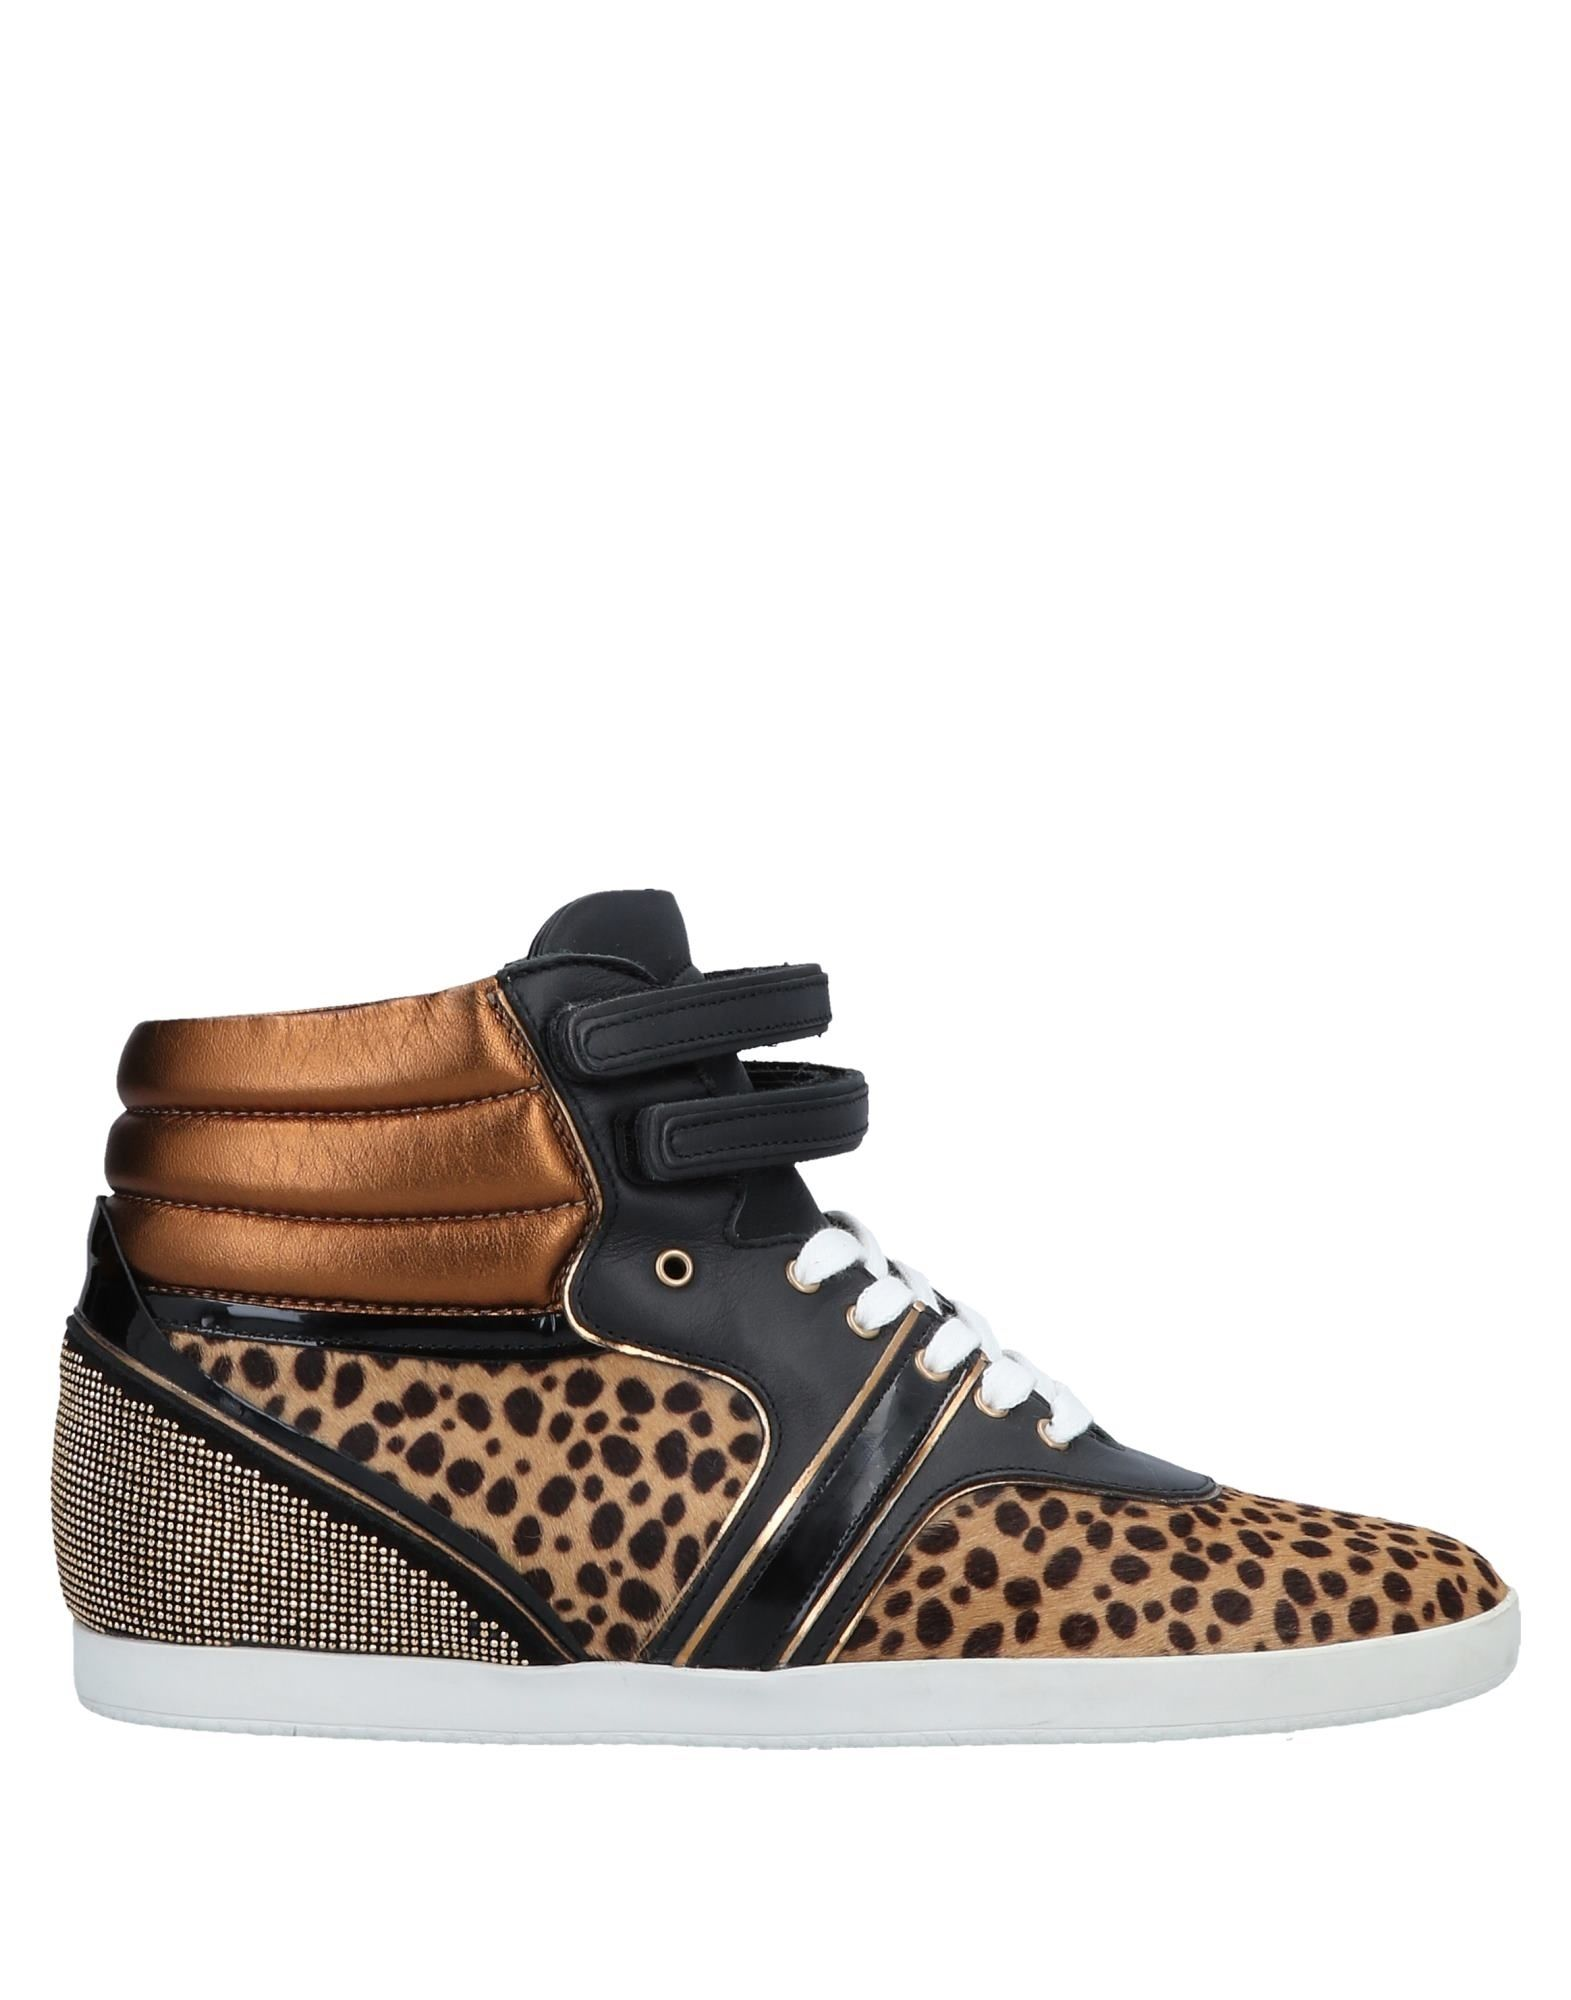 Sergio Rossi Sneakers Sneakers Sneakers - Women Sergio Rossi Sneakers online on  United Kingdom - 11569076RJ 4f5045